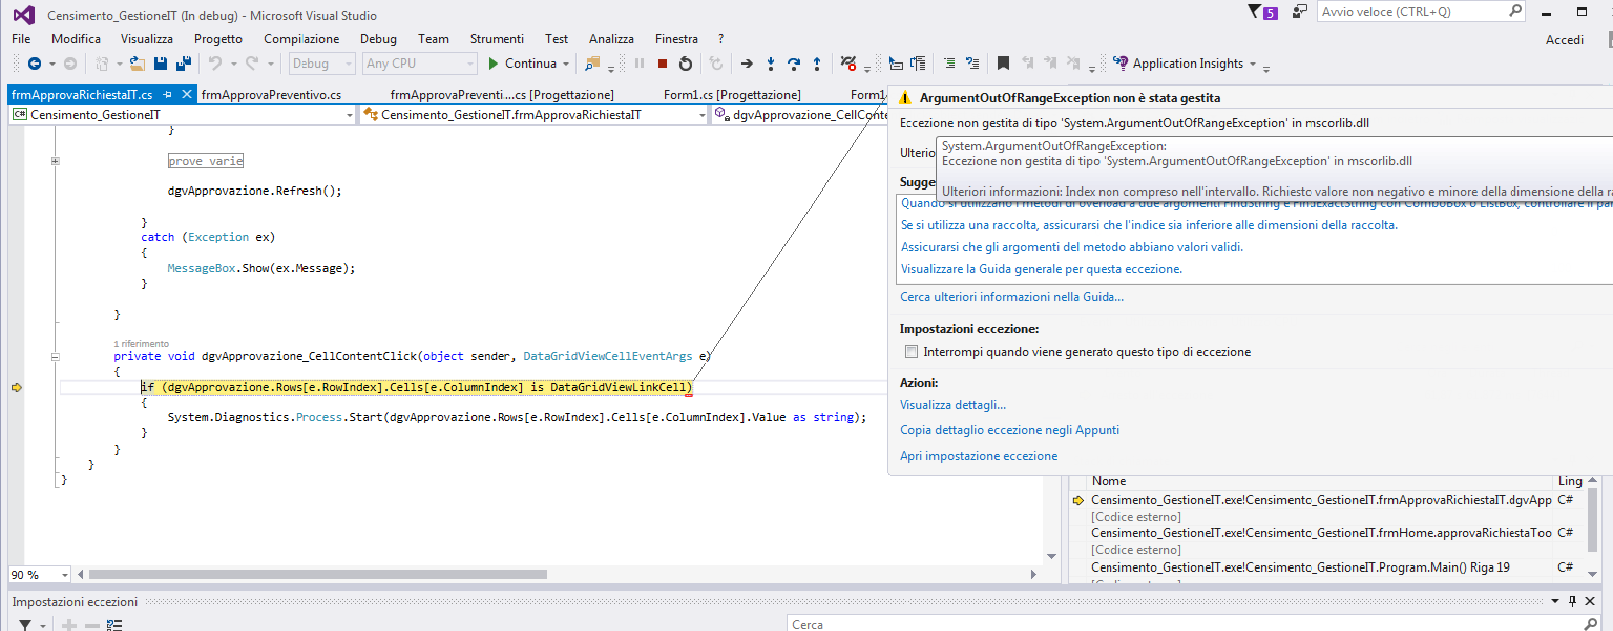 datagridview in c windows application sample